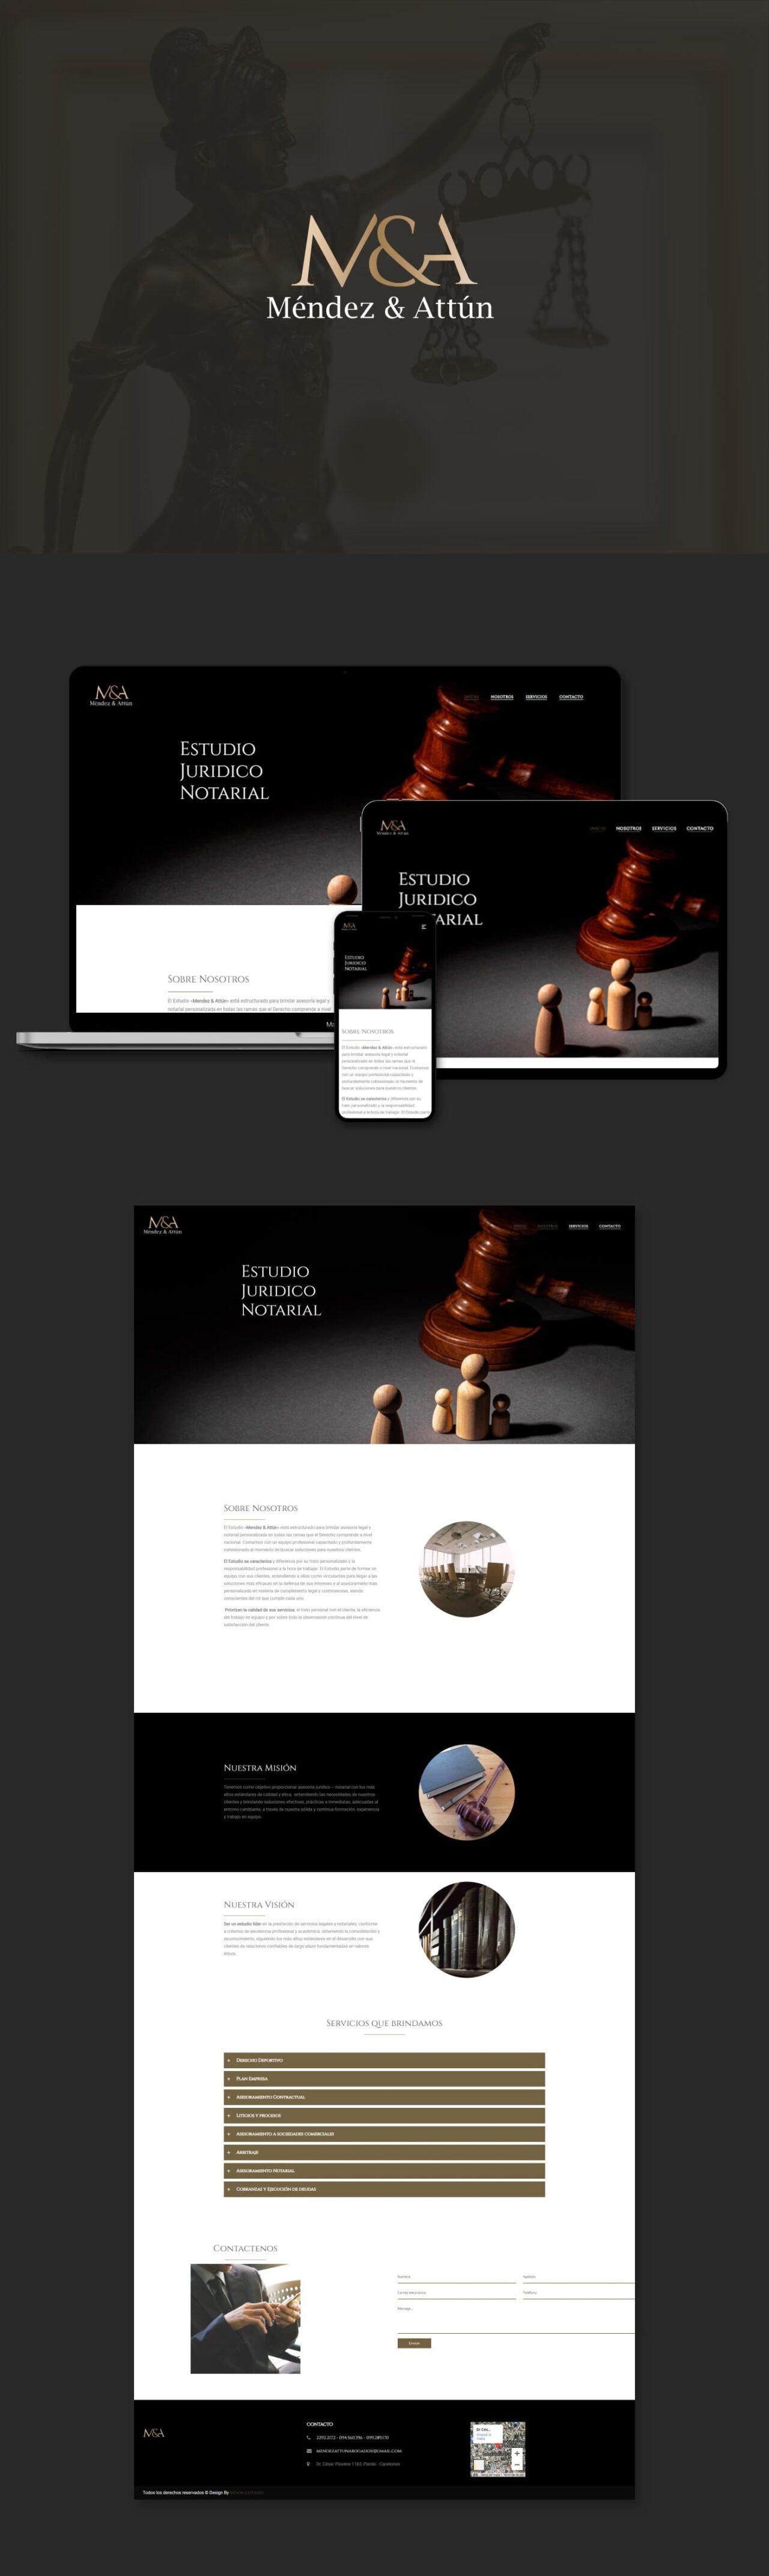 Diseño de pagina web mendes & Attun